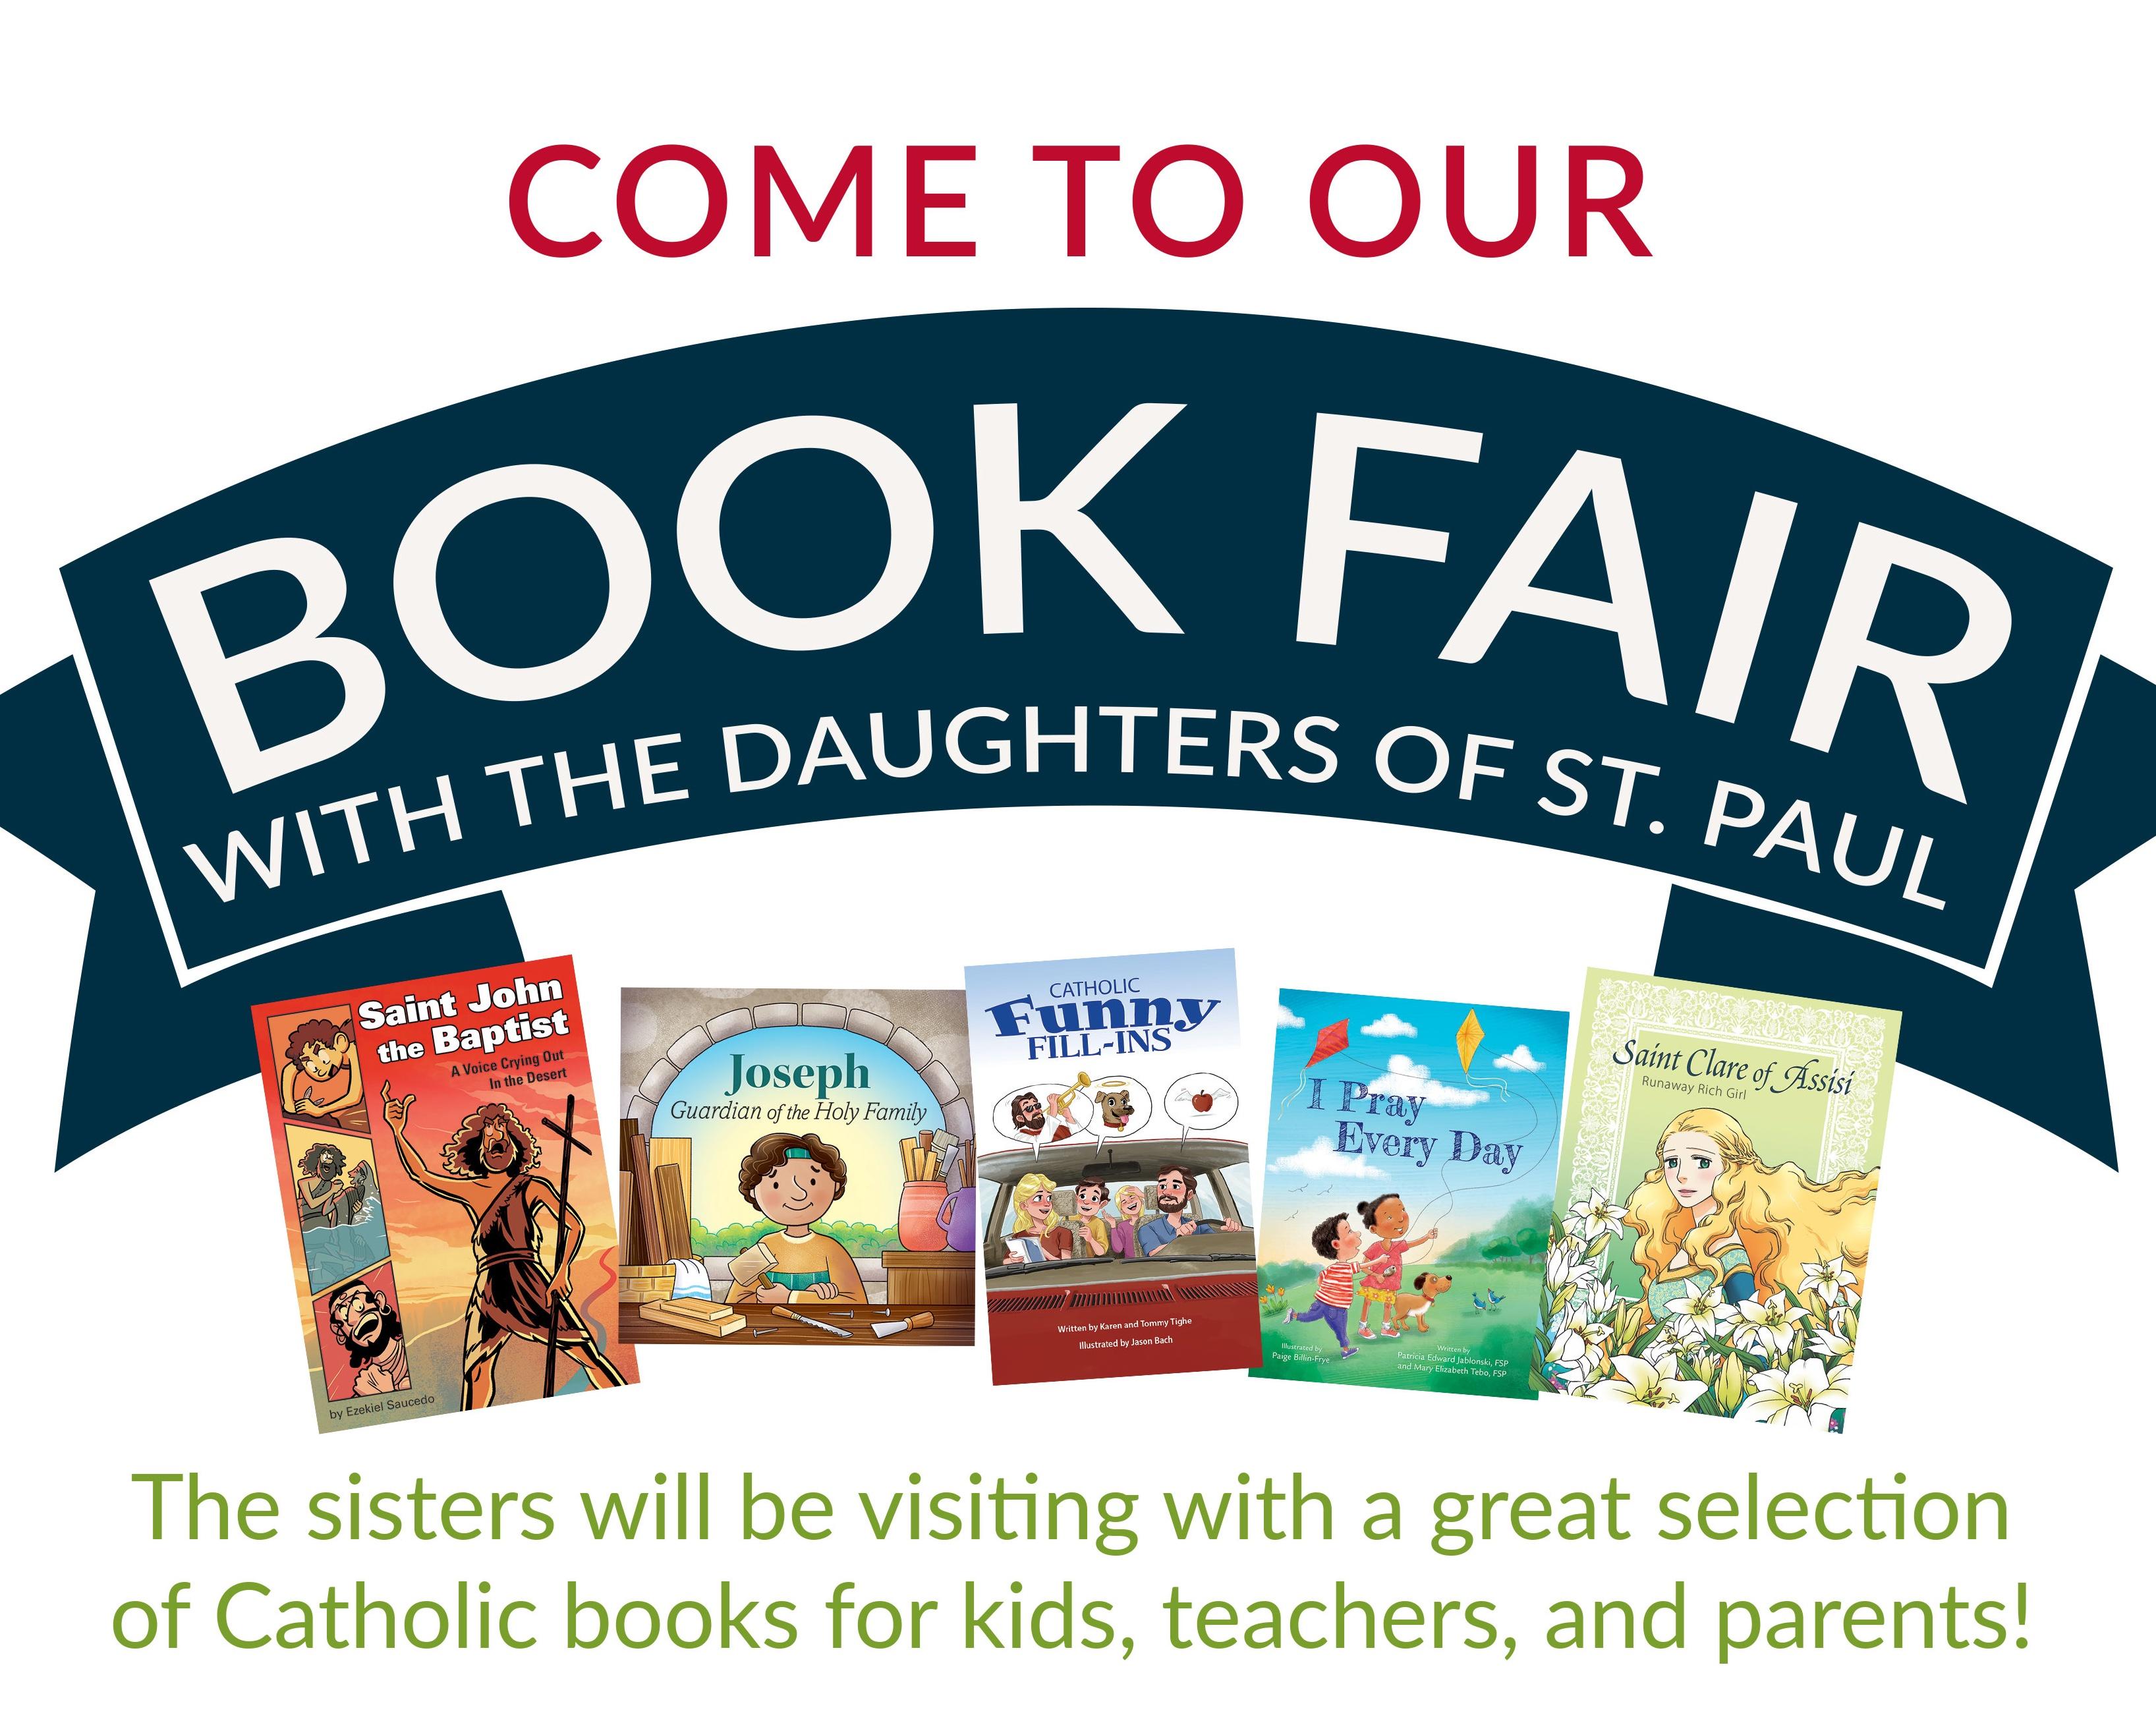 School Book Fair at Queen of All Saints School @ Queen of All Saints School